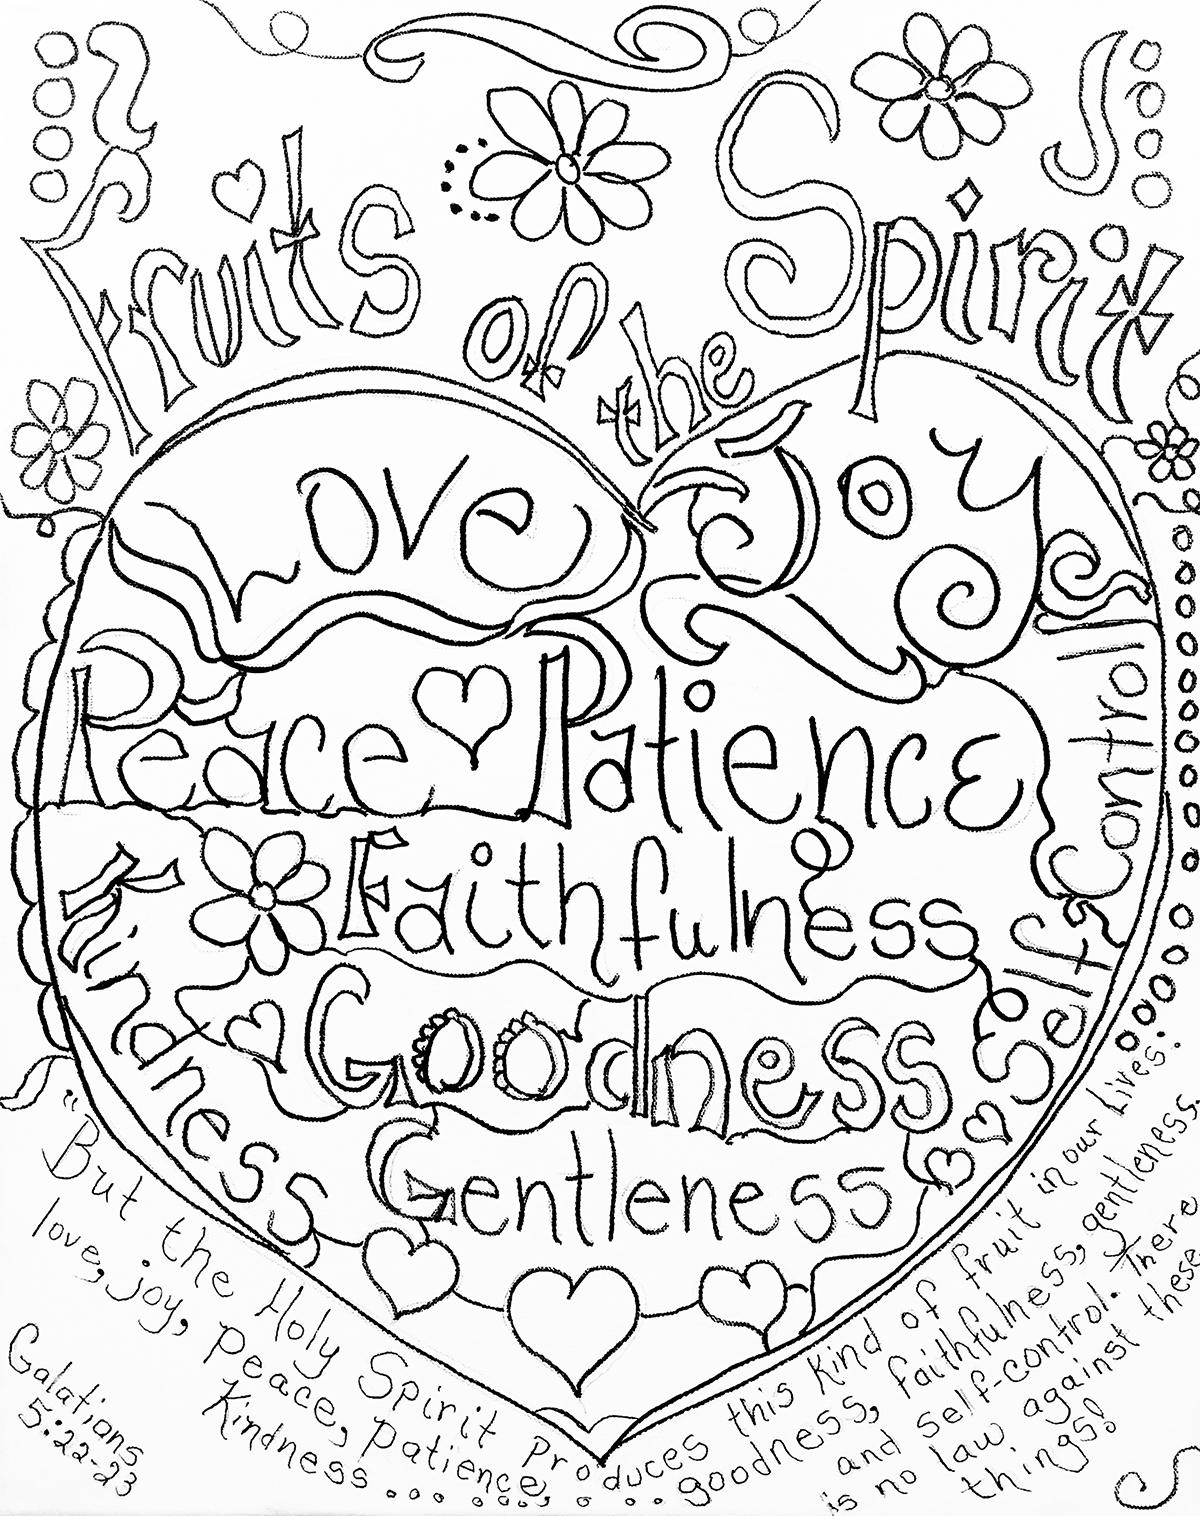 Fruits Of The Spirit Coloring Pagecarolyn Altman. Galatians 5:22 - Fruit Of The Spirit Free Printable